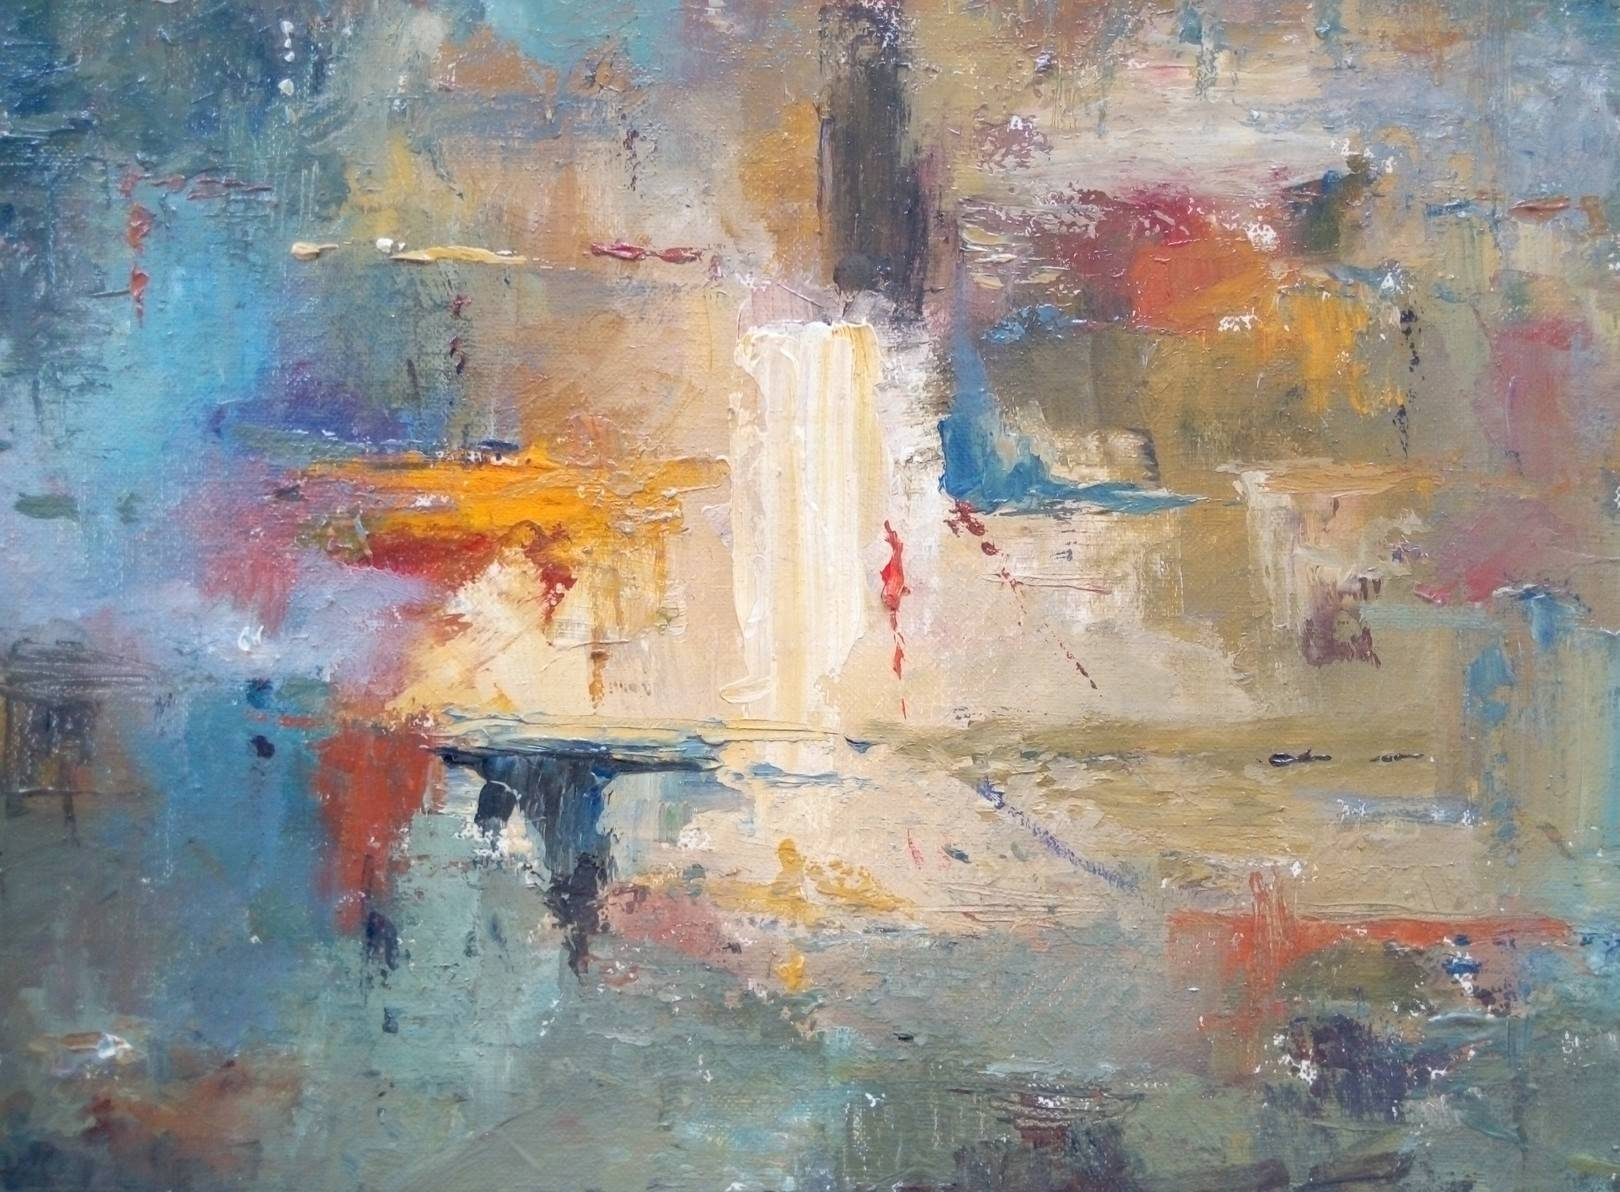 «Жаркий день»    холст, масло «Hot day»             oil on canvas 24x30, 2010